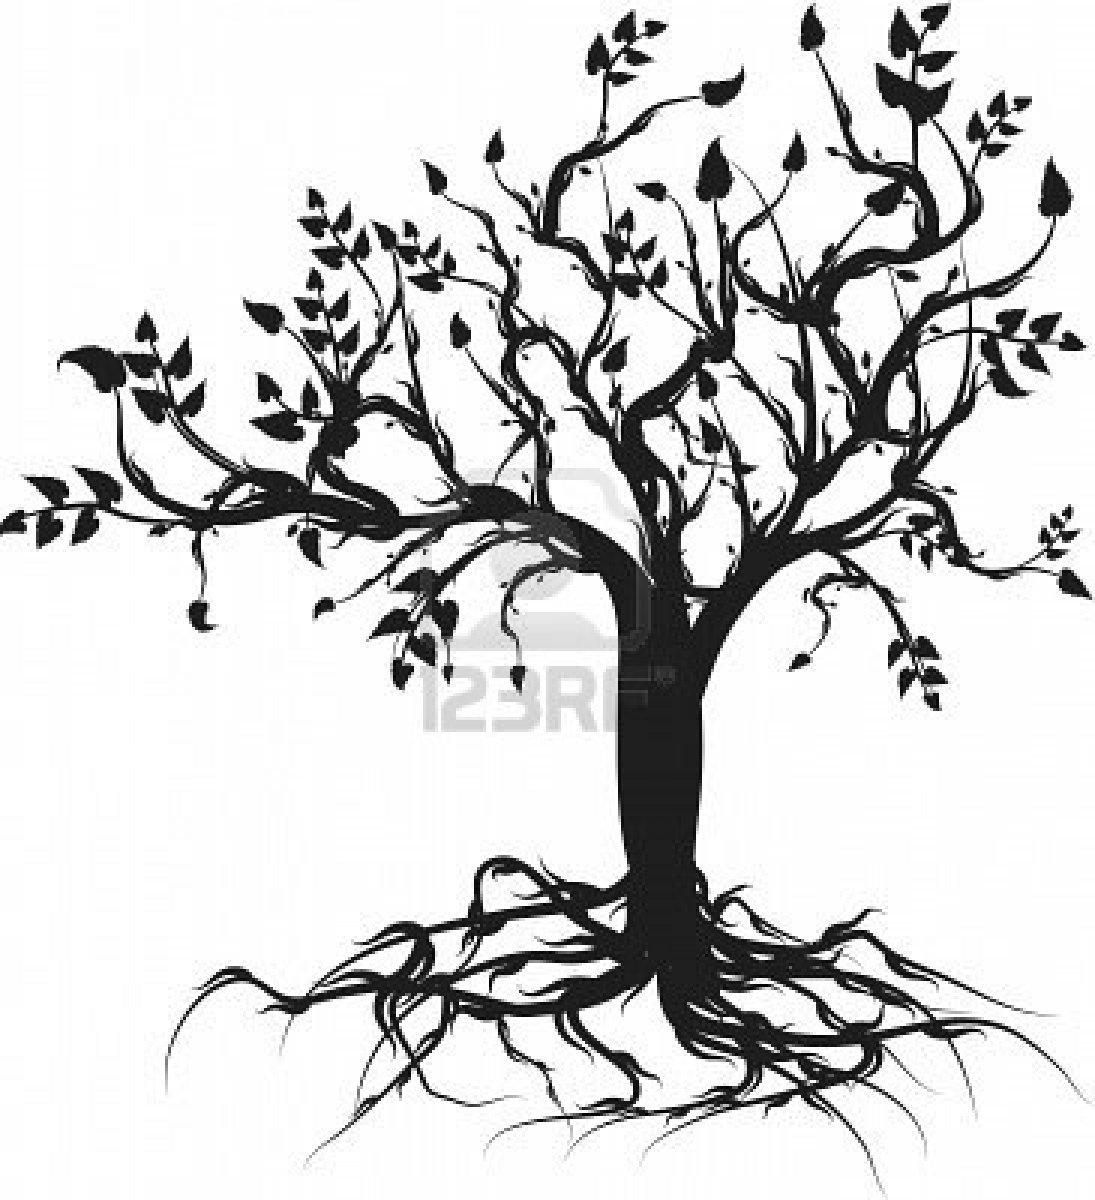 1095x1200 Drawn Roots Cherry Blossom Tree